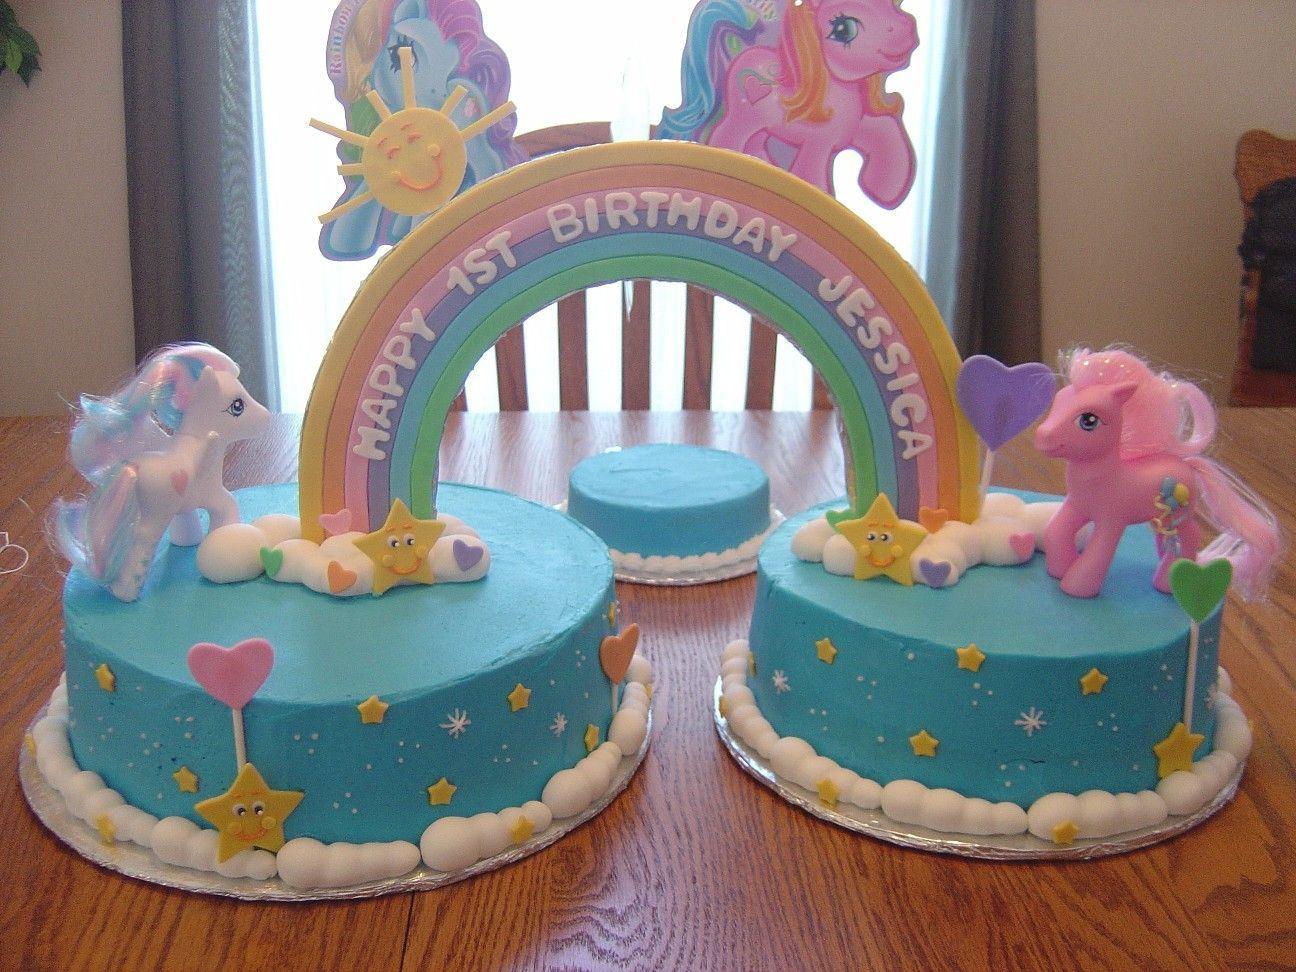 My Little Pony Cake With Images Little Pony Cake Pony Cake